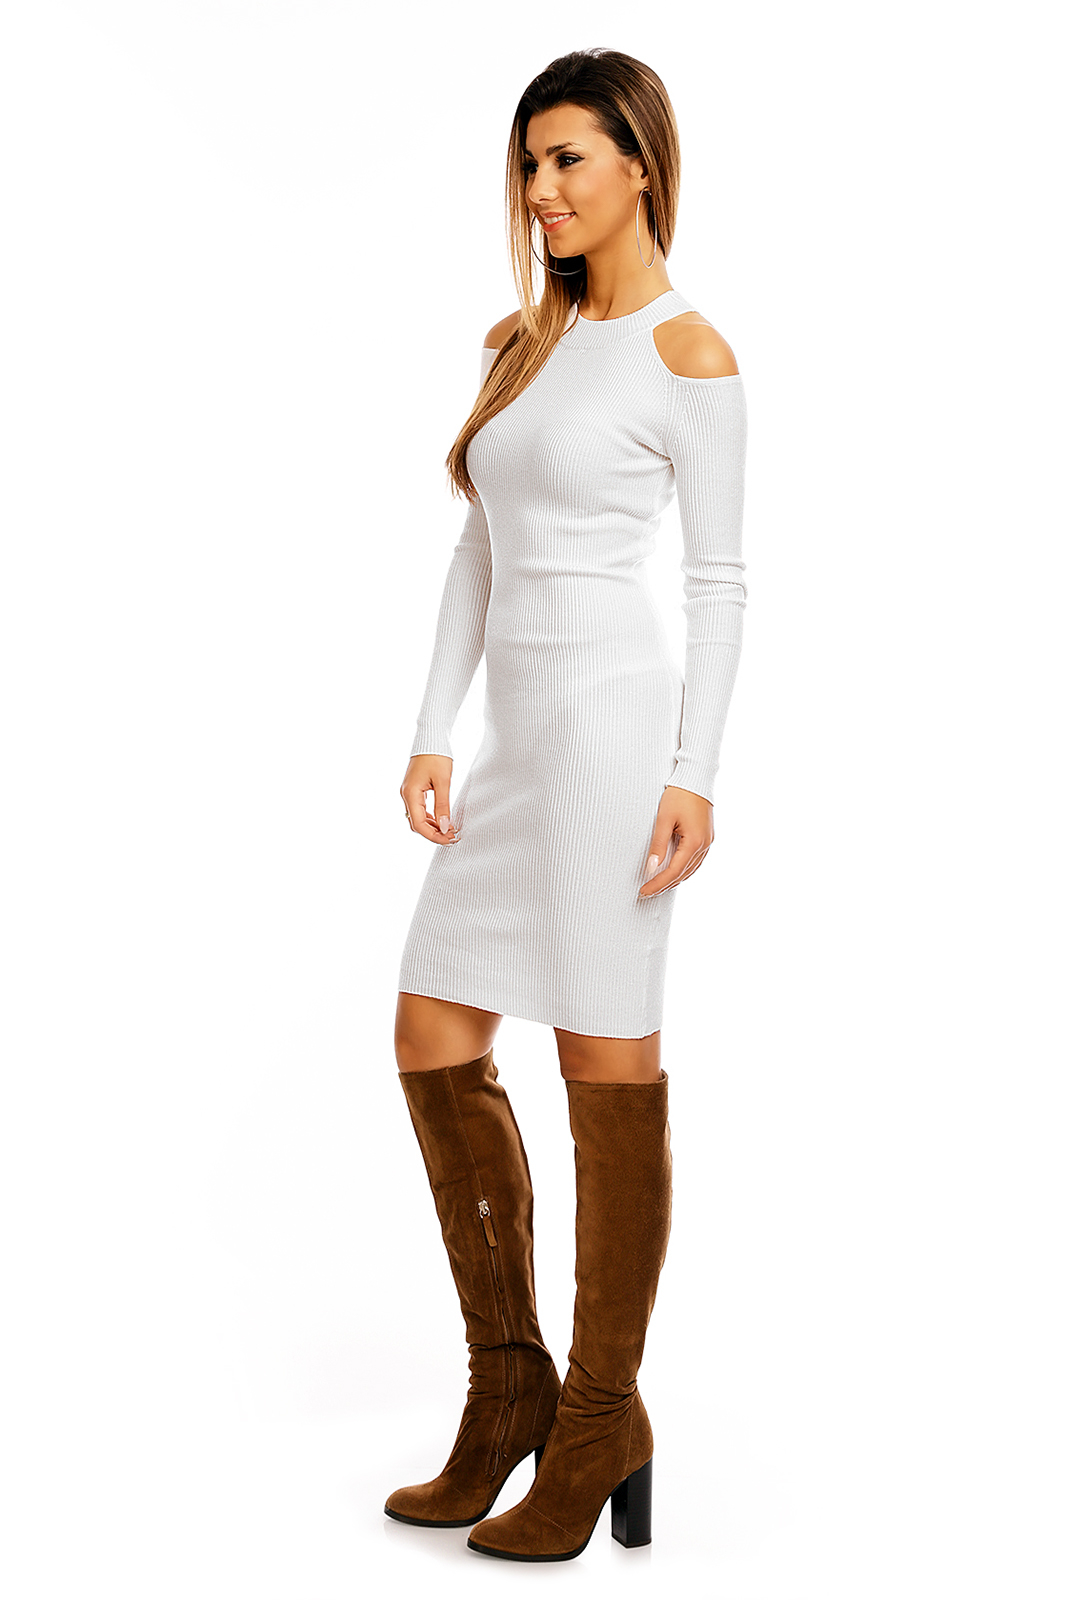 Kleid SHK K30 Weiss - One Size